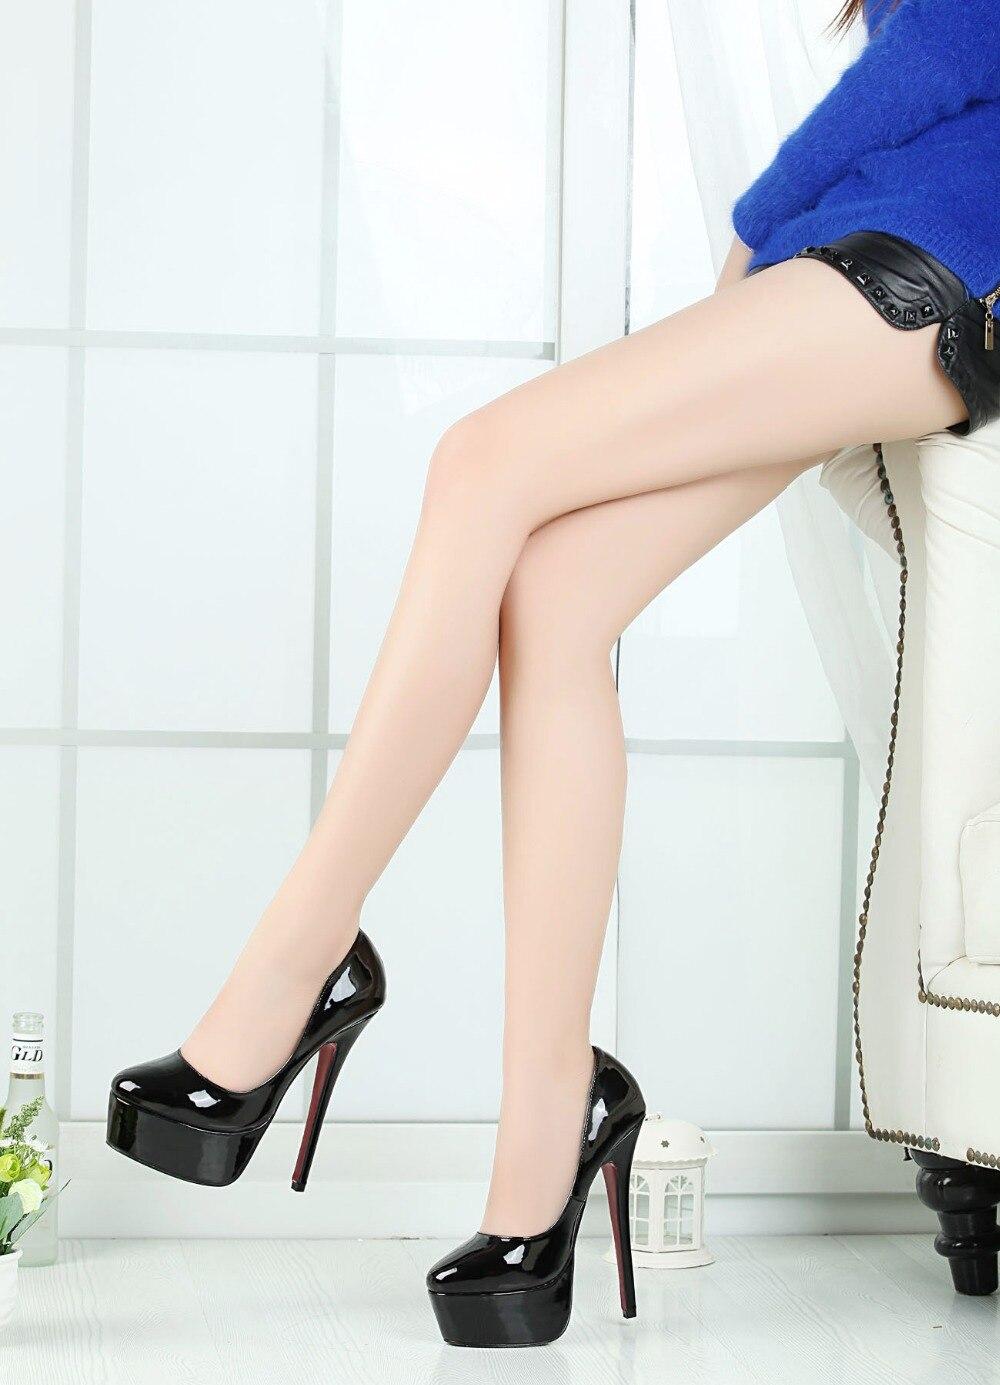 83645b5c73 Crossdresser Sexy Stiletto Plus:40-47 48 Padlock zapatos mujer Pointed Toe  Ankle Strap shoes woman 12cm metal thin heels PumpsUSD 42.48/pair